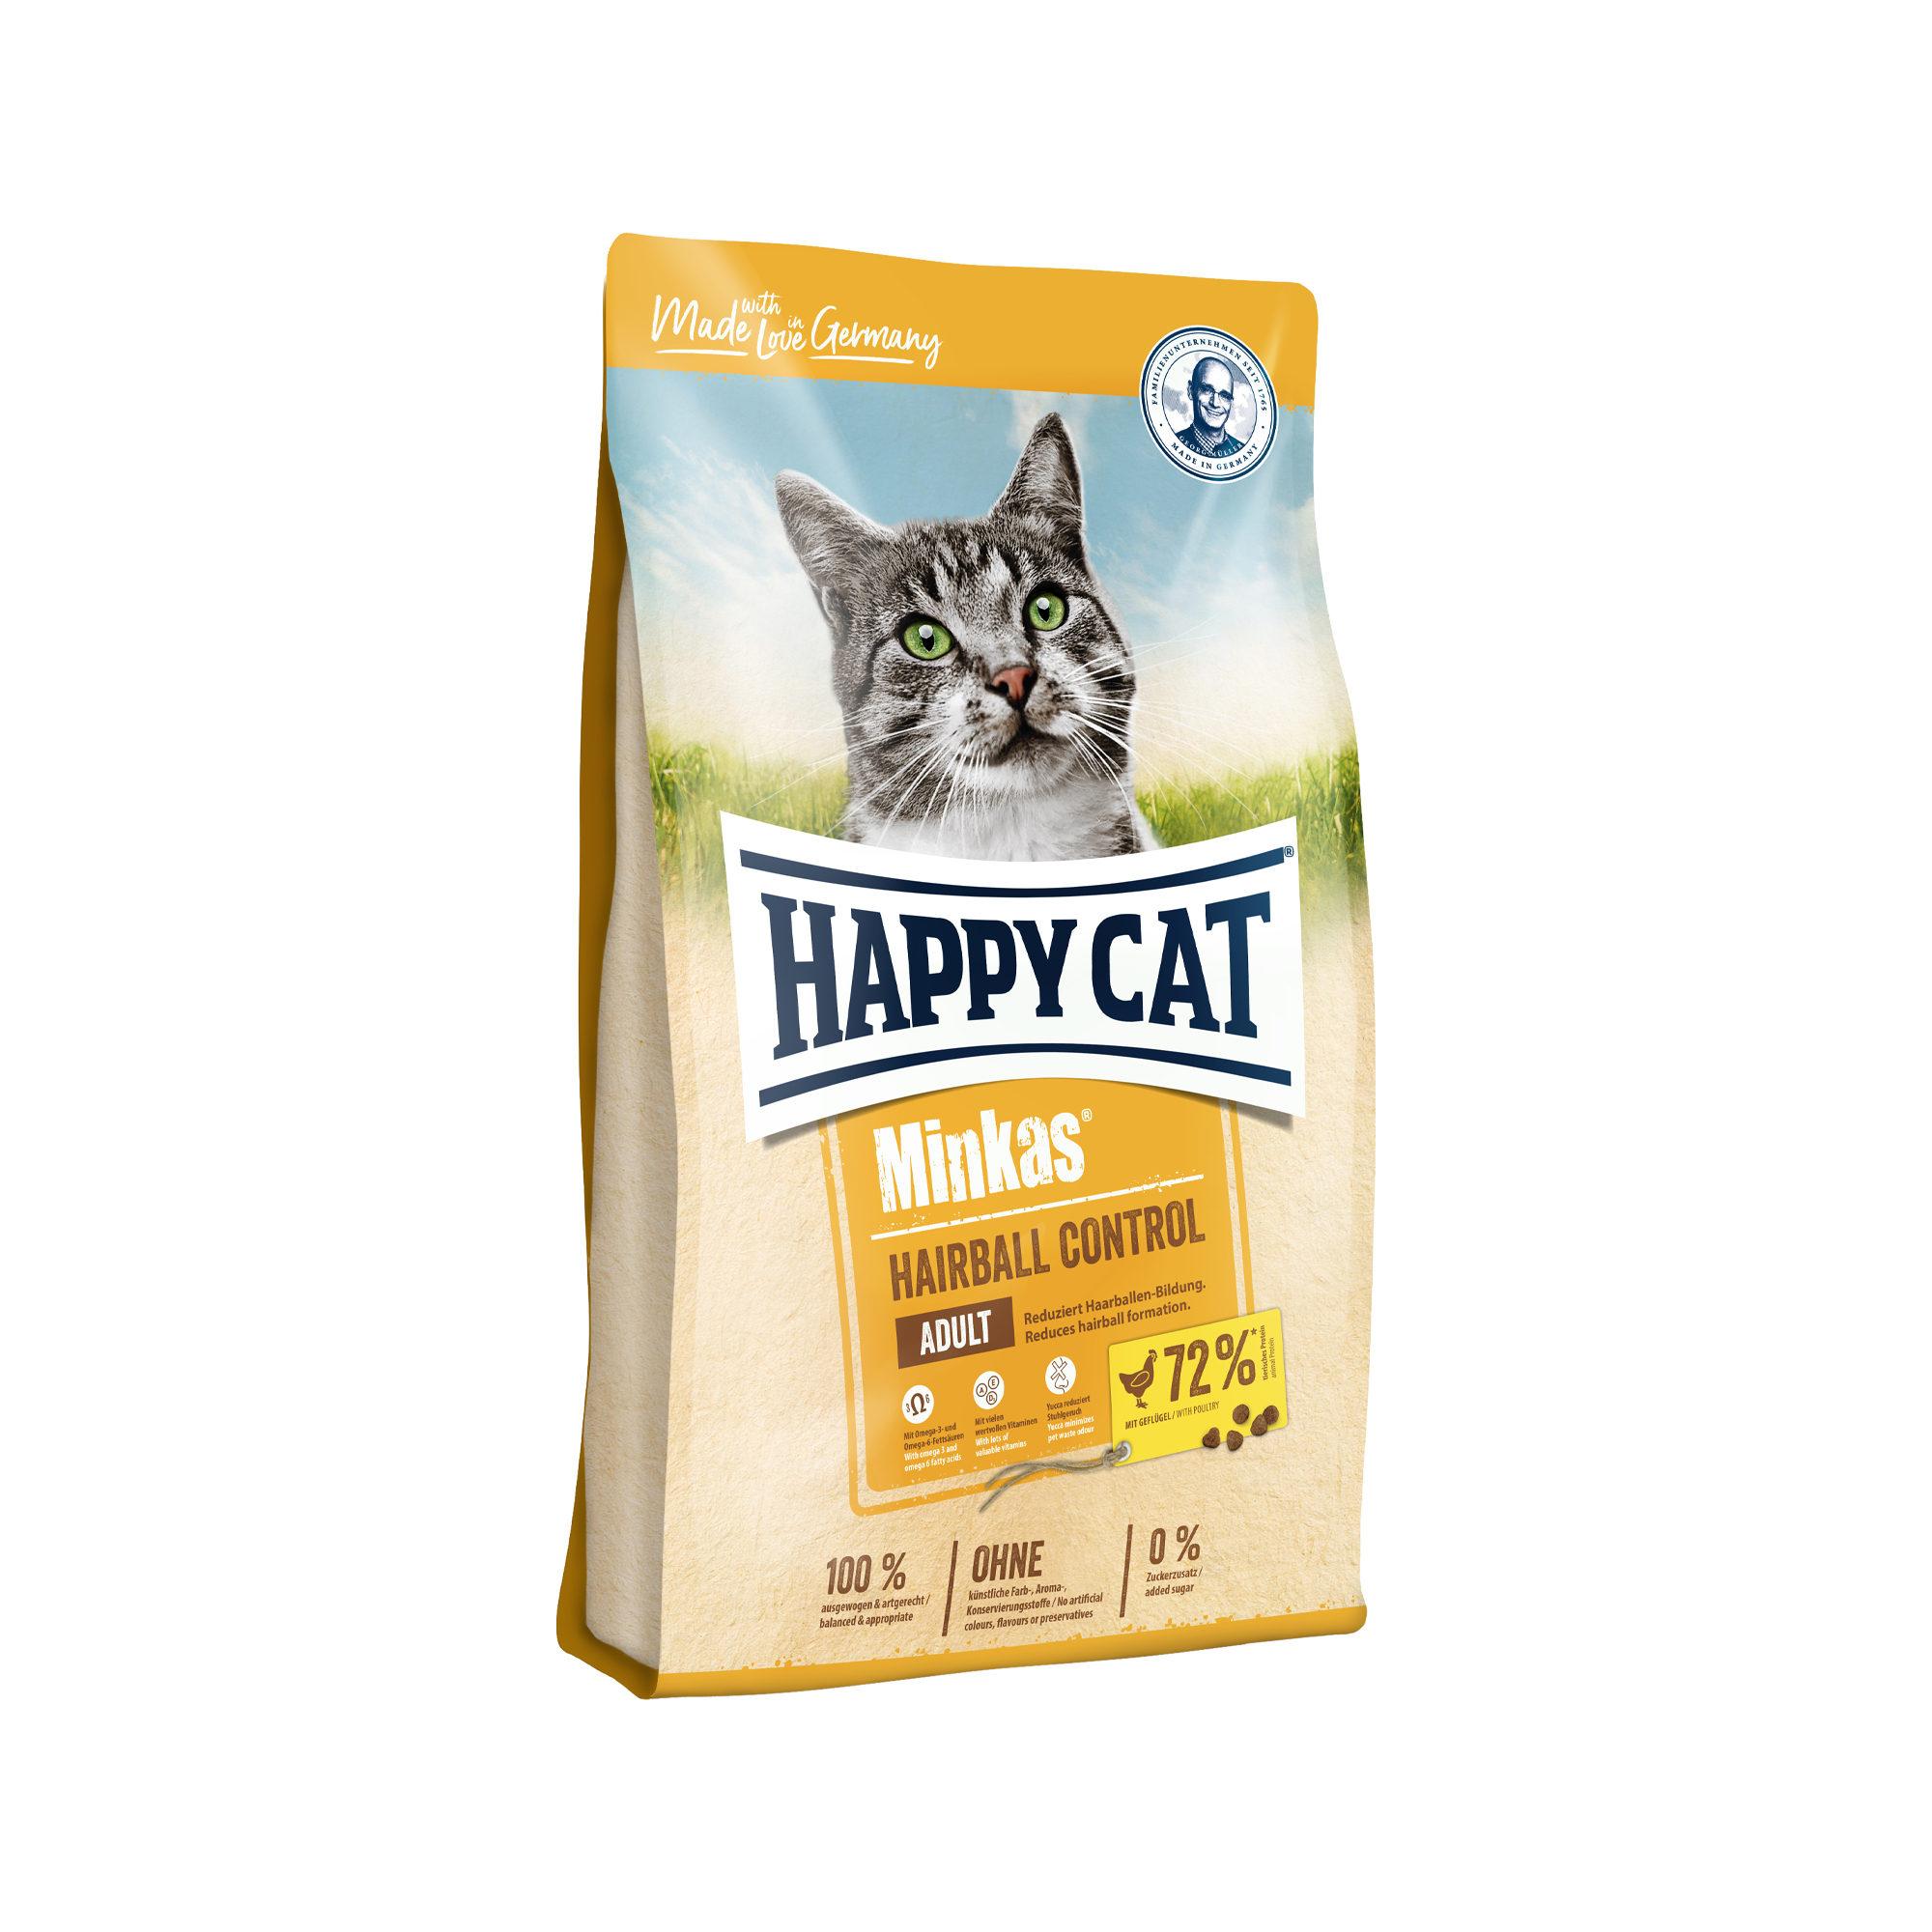 Happy Cat Minkas Adult Hairball Control Katzenfutter - Geflügel